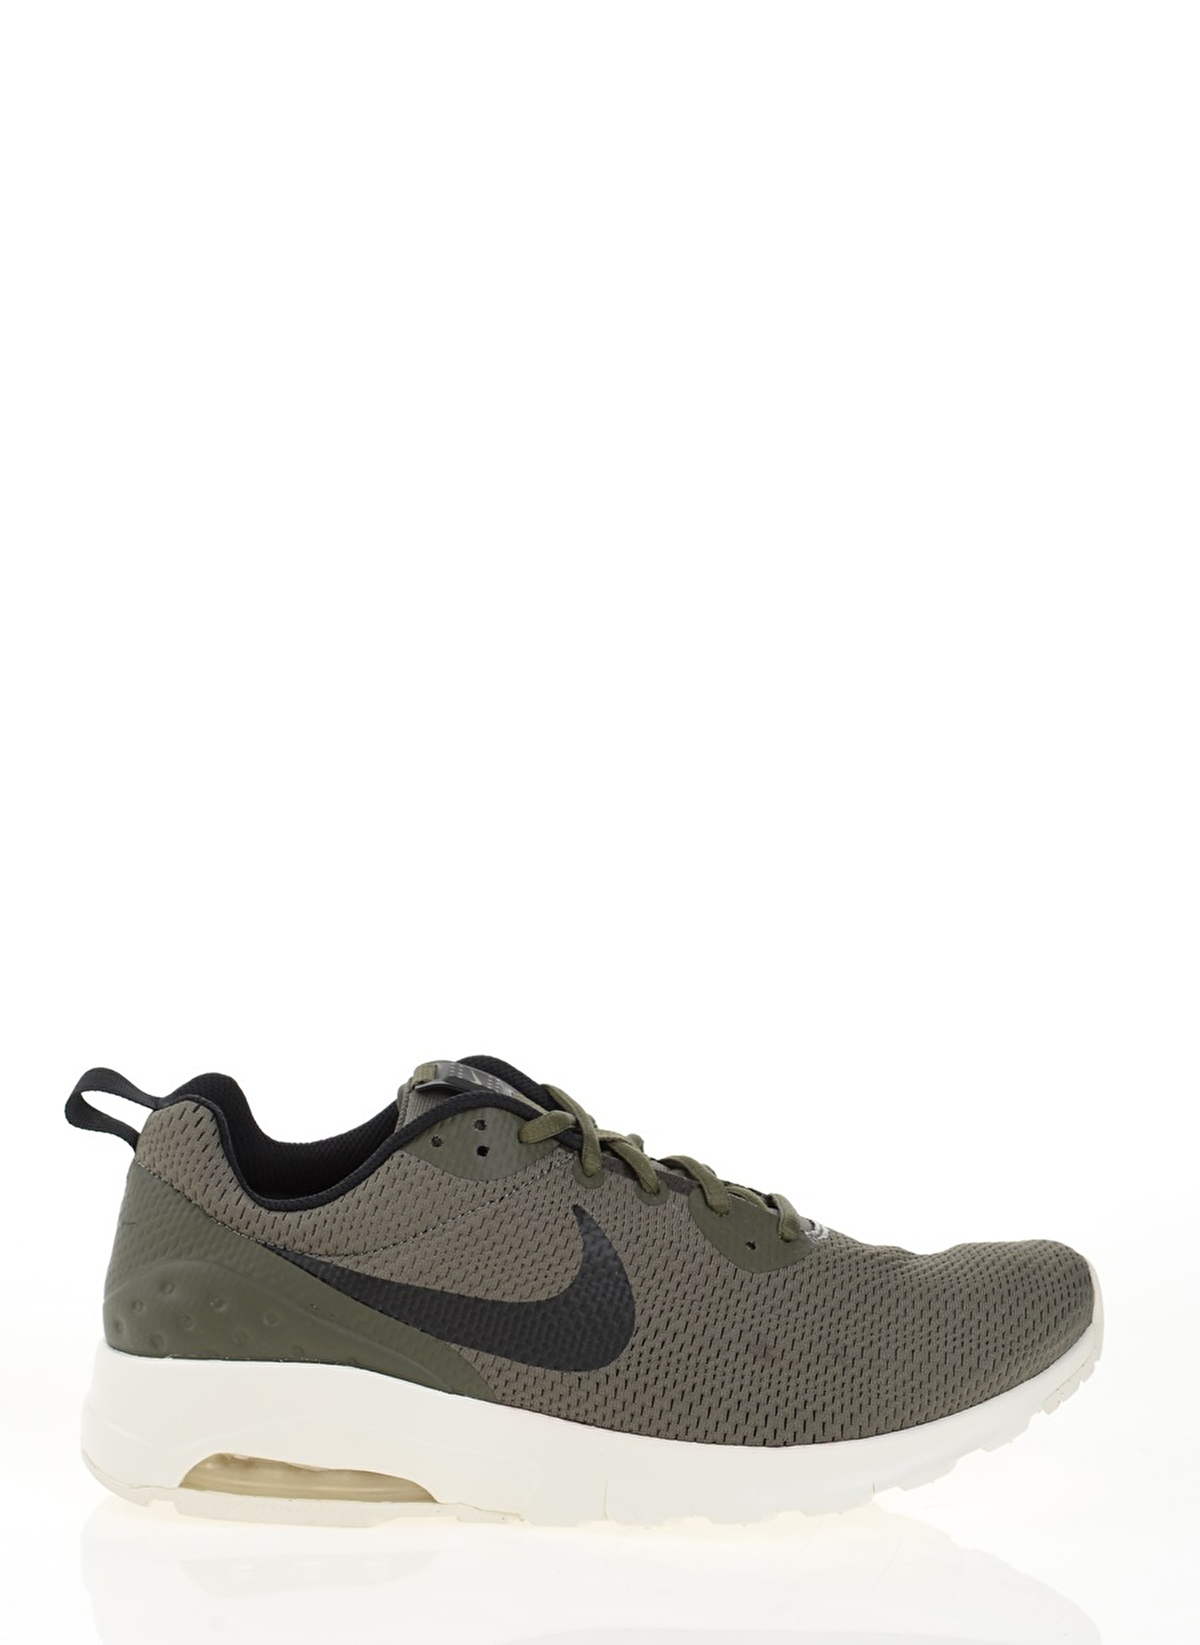 new concept fe3c7 16861 ... Nike Nike Air Max Motion Lw Se Yeşil ...